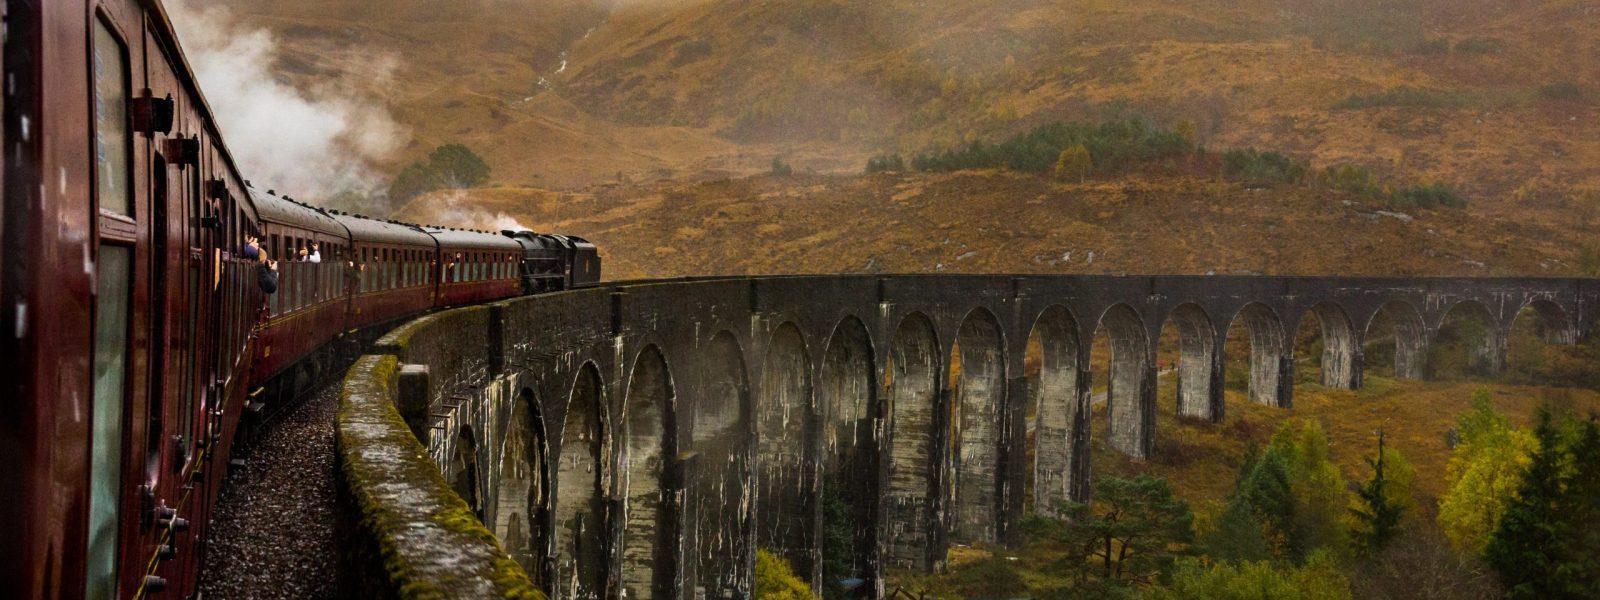 Interrail routes: 6 mooiste treinreizen door Europa